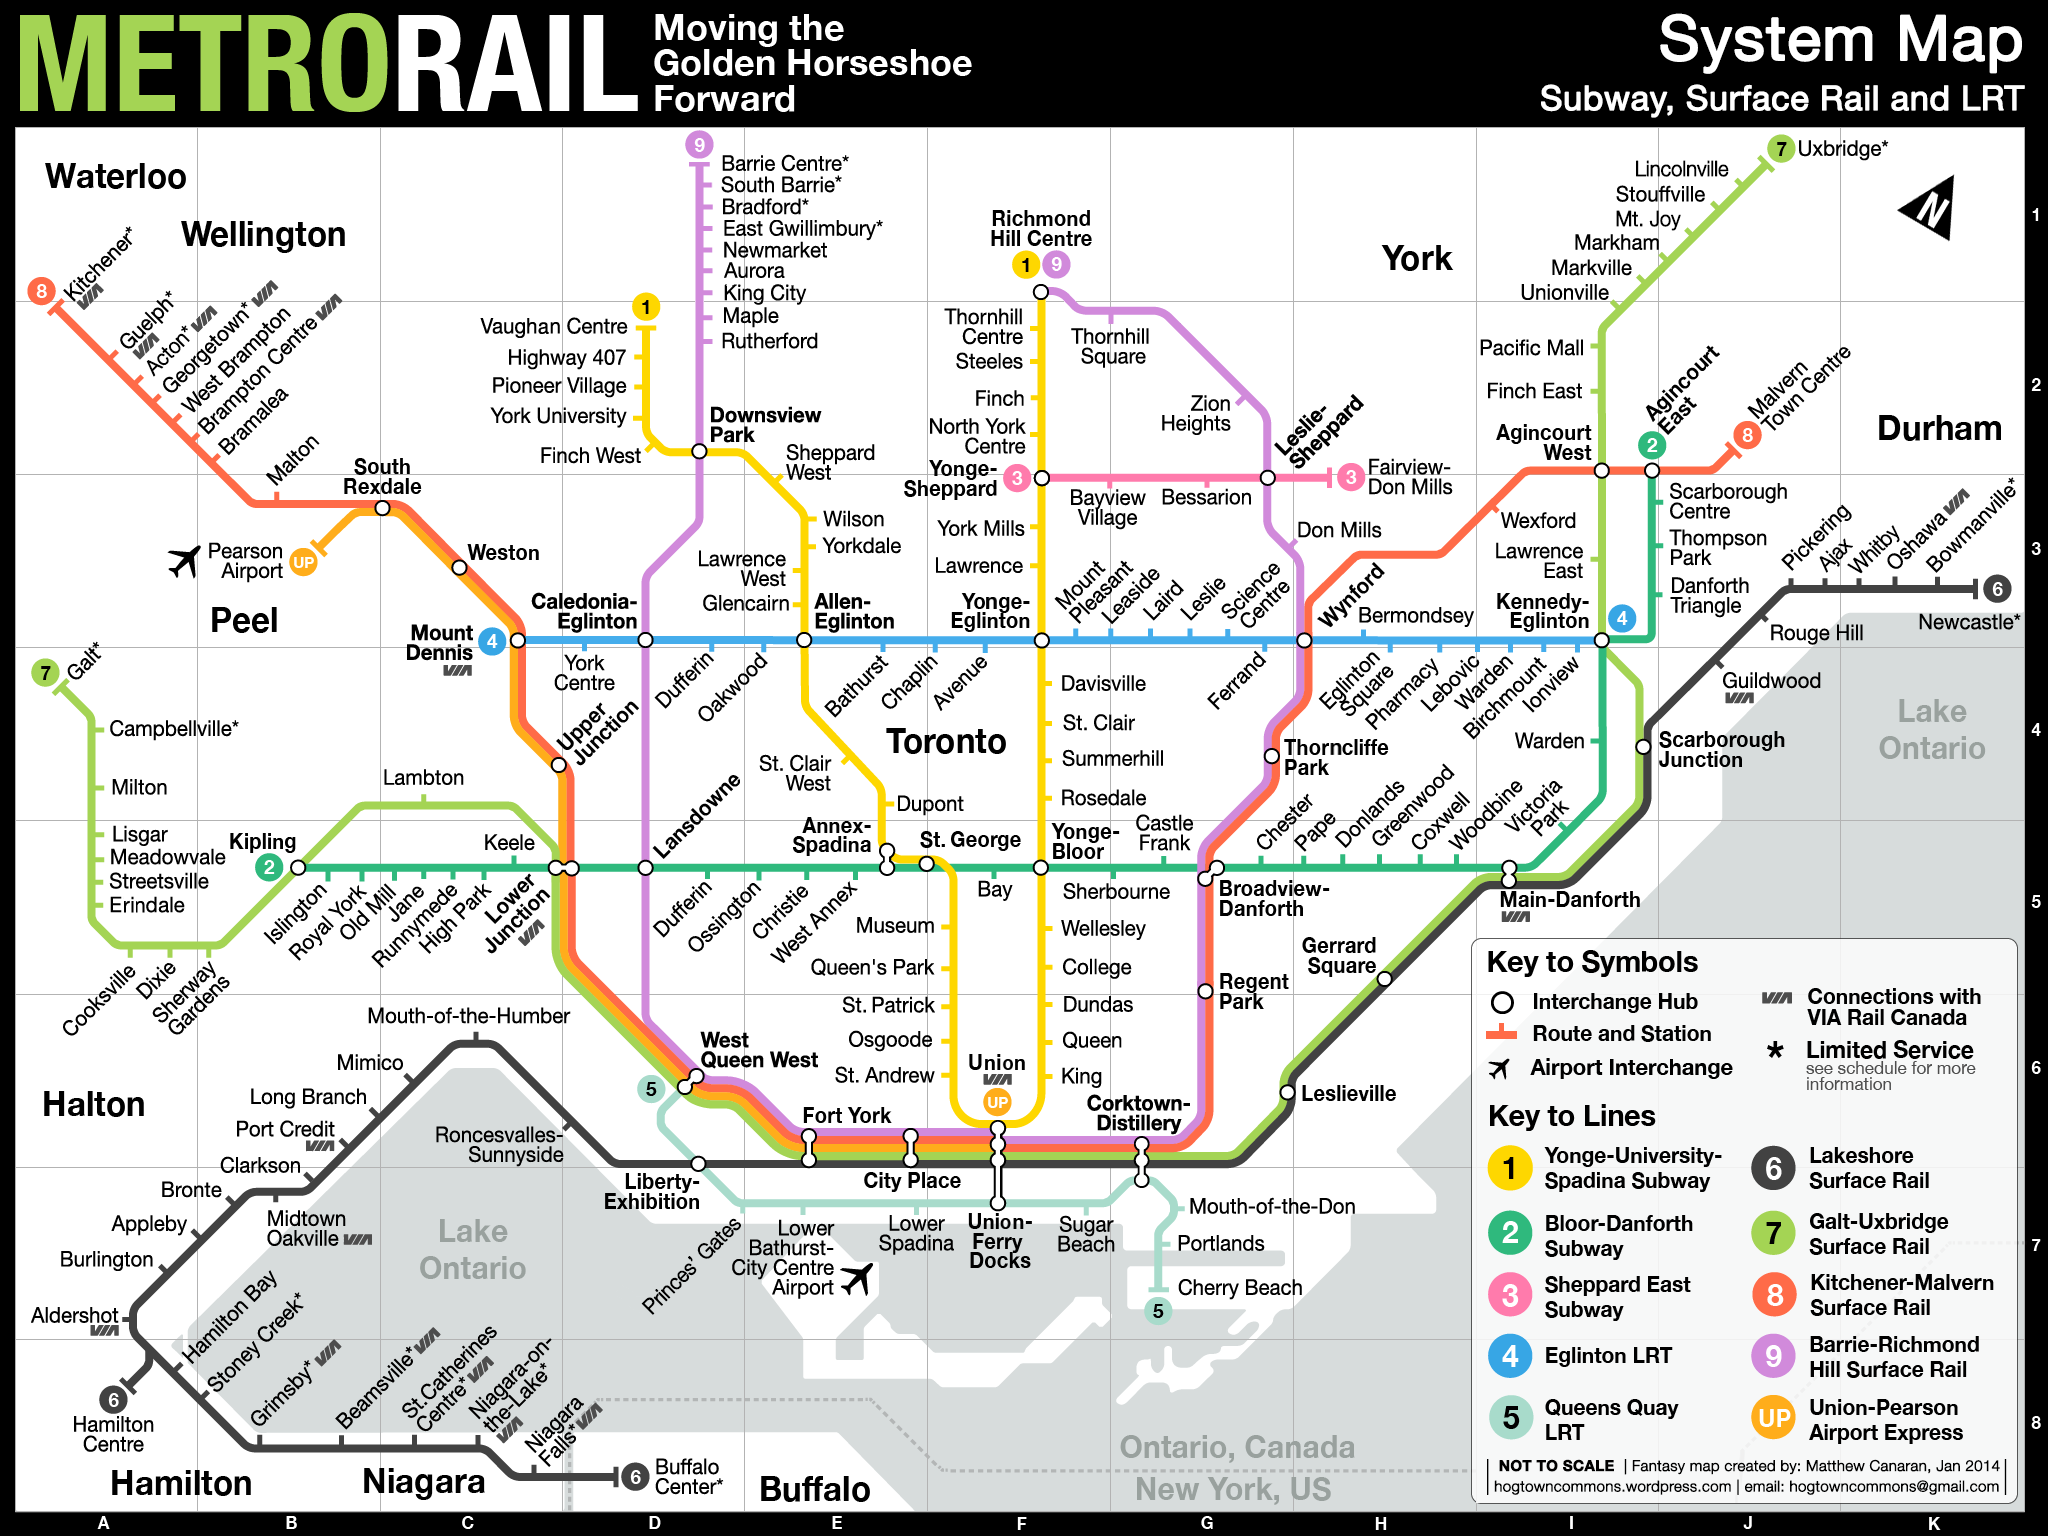 Fantasy Washington Metro Map By J Nelson Leith WMATA Transit Map - Washington dc map subway